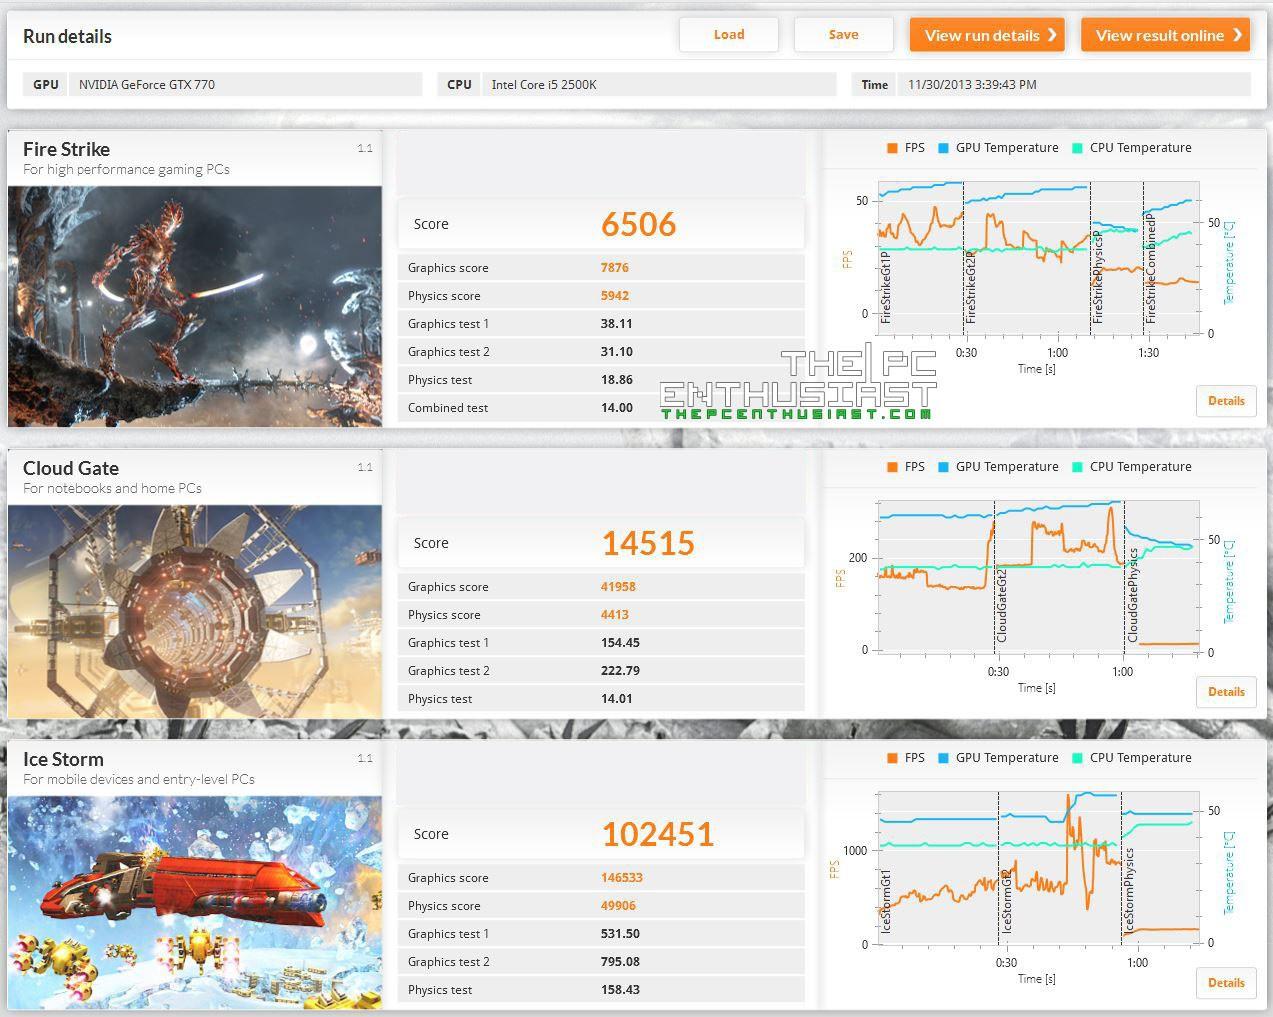 Asus GeForce GTX 770 DirectCU II OC (GTX770-DC2OC-2GD5) Review